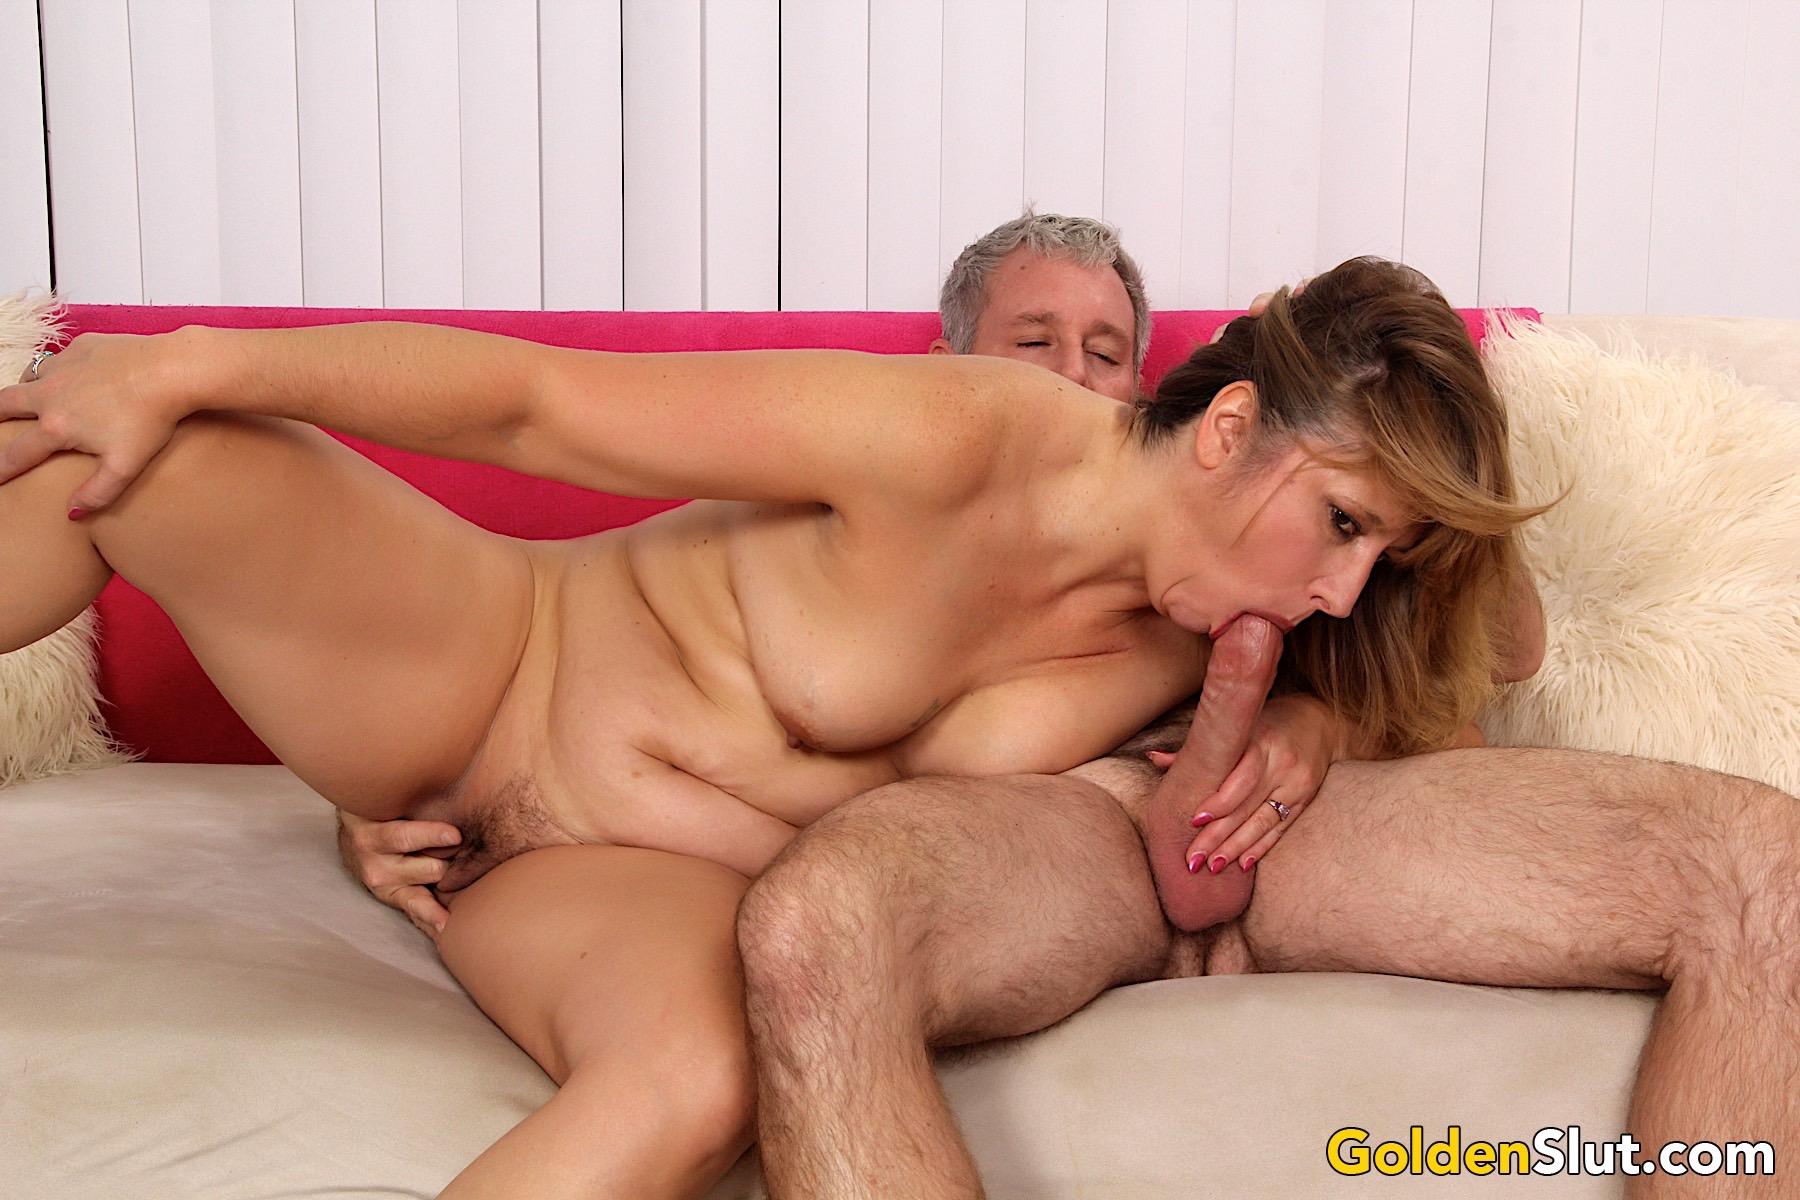 situation familiar midget girls sucking cock have hit